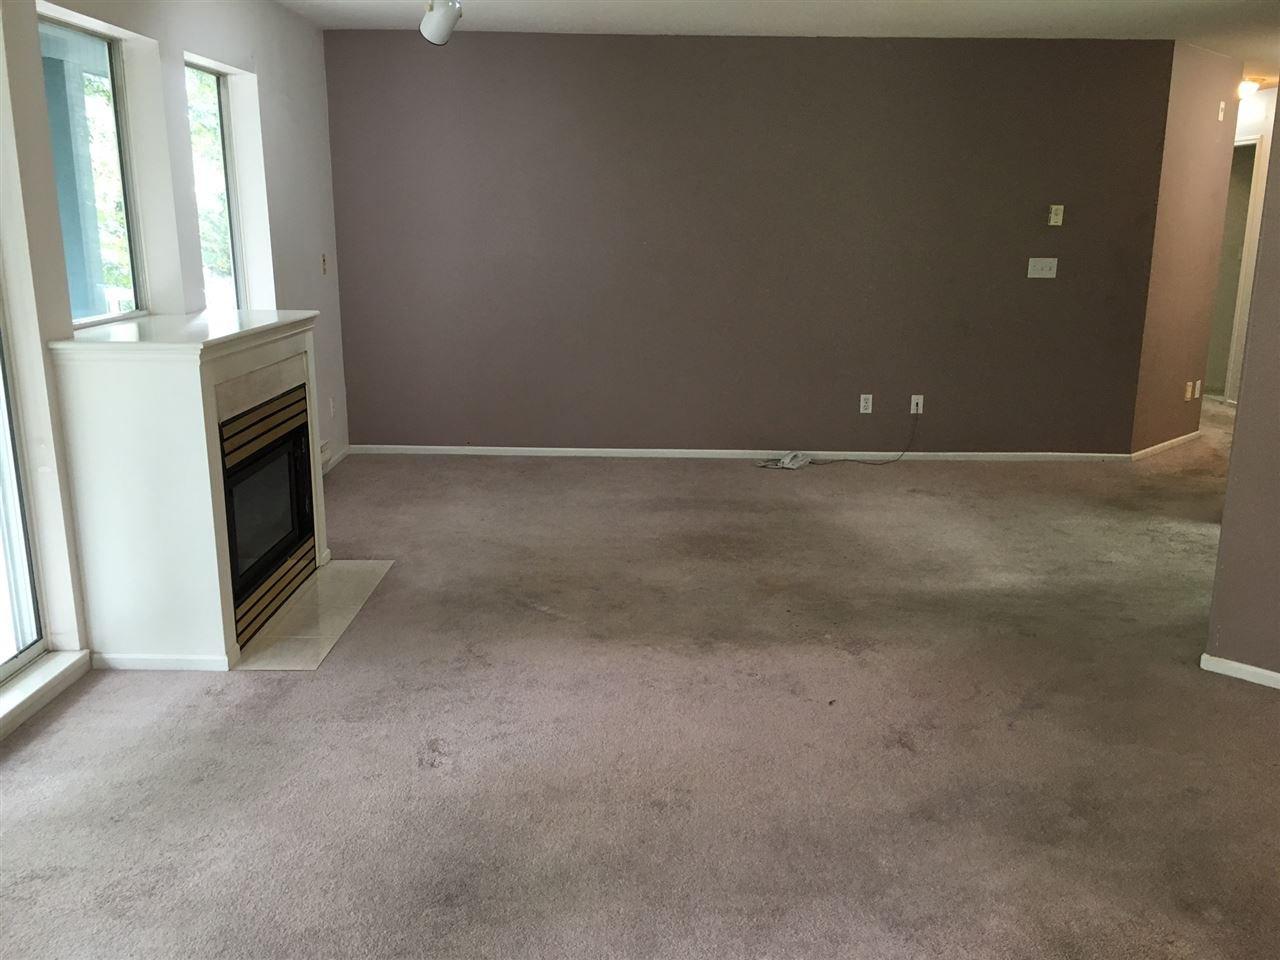 "Photo 6: Photos: 207 27358 32 Avenue in Langley: Aldergrove Langley Condo for sale in ""Willow Creek"" : MLS®# R2207746"